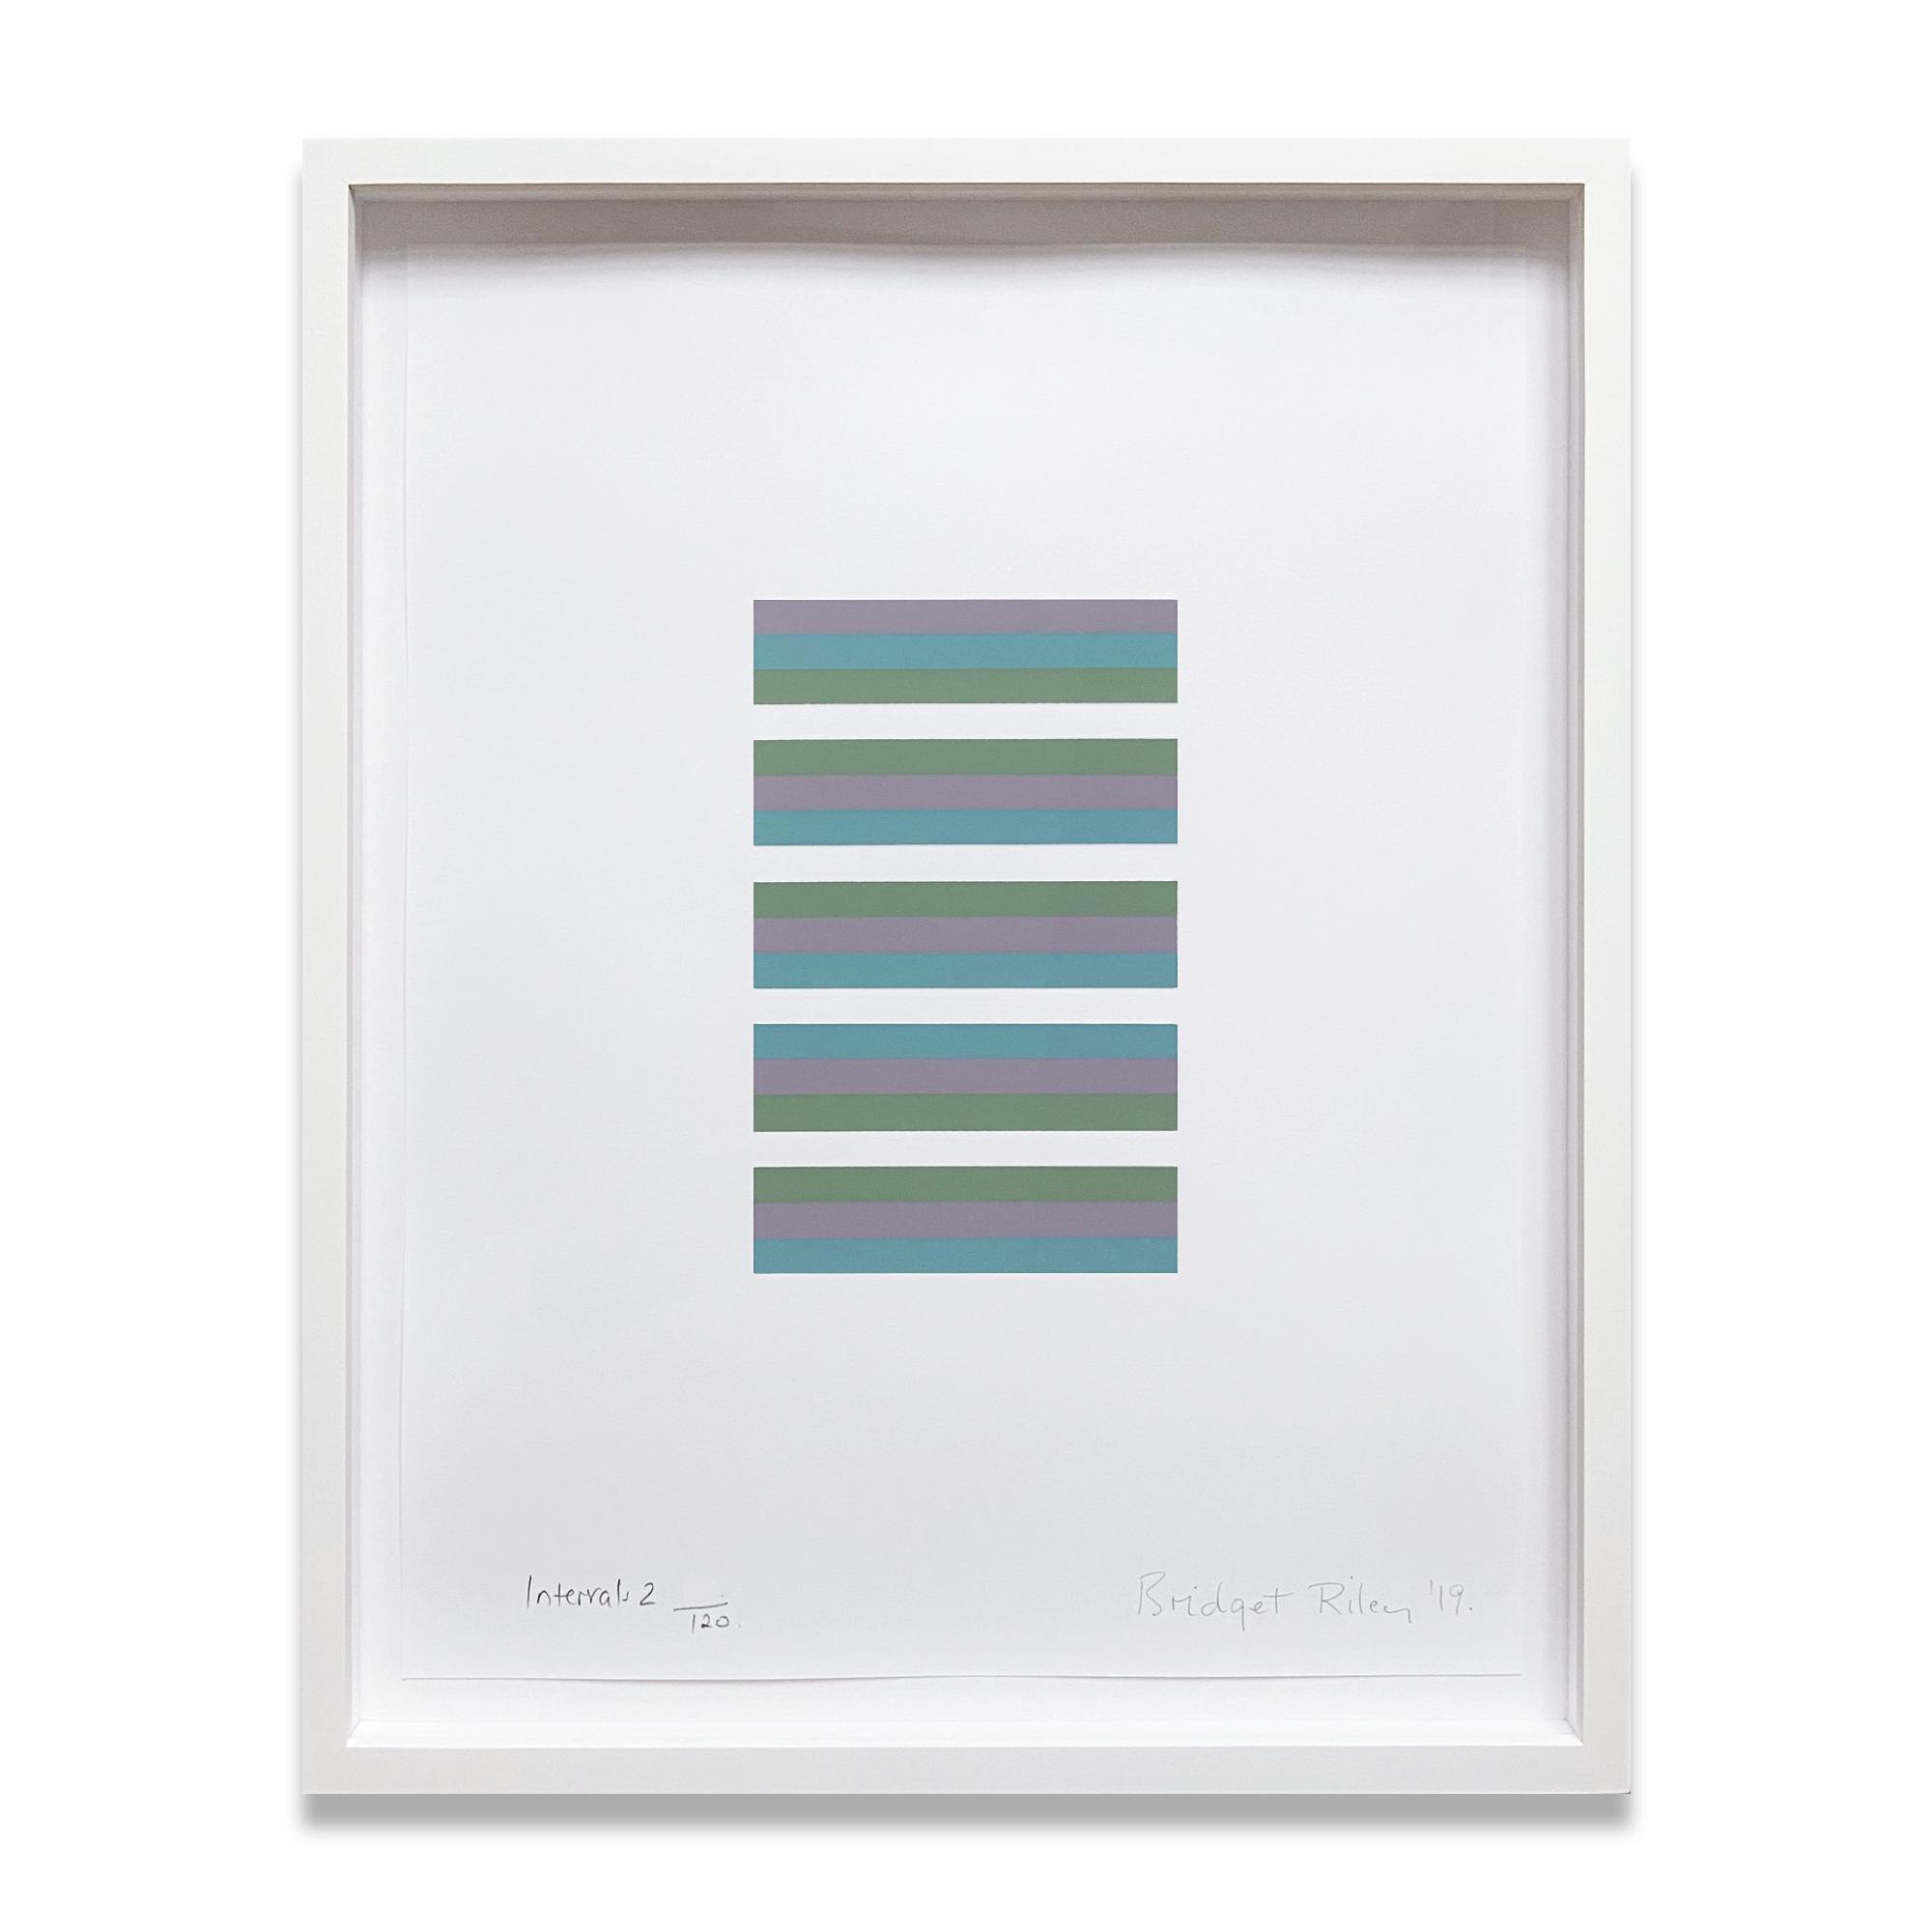 Intervals 2, Screenprint, 2019, Minimalism, Abstract Geometric, Op Art